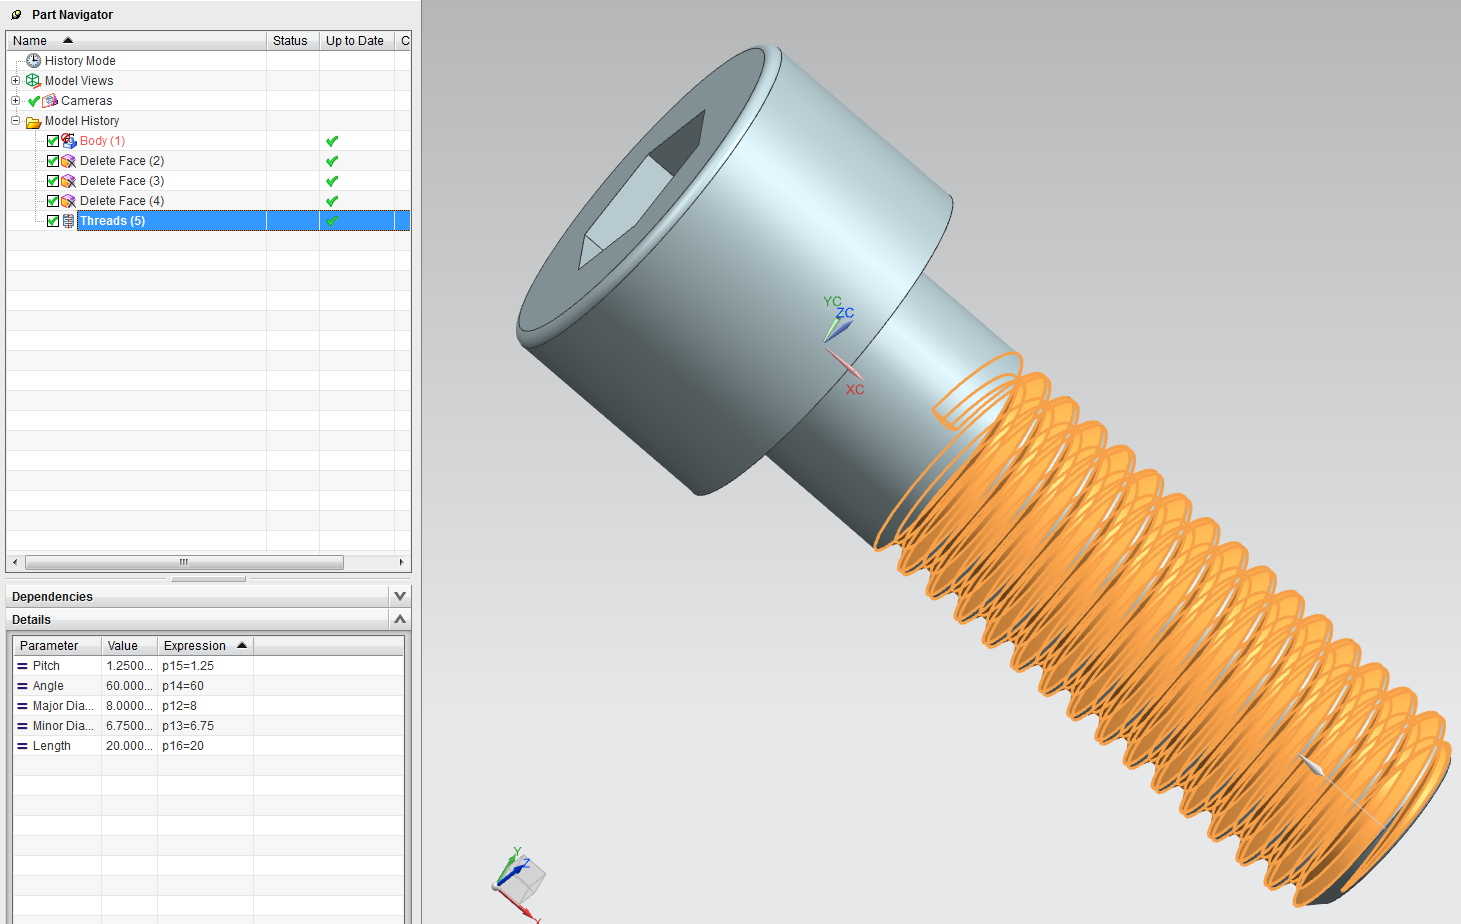 model 4_Siemens NX_InnoDriveSys_Ivan Venkov